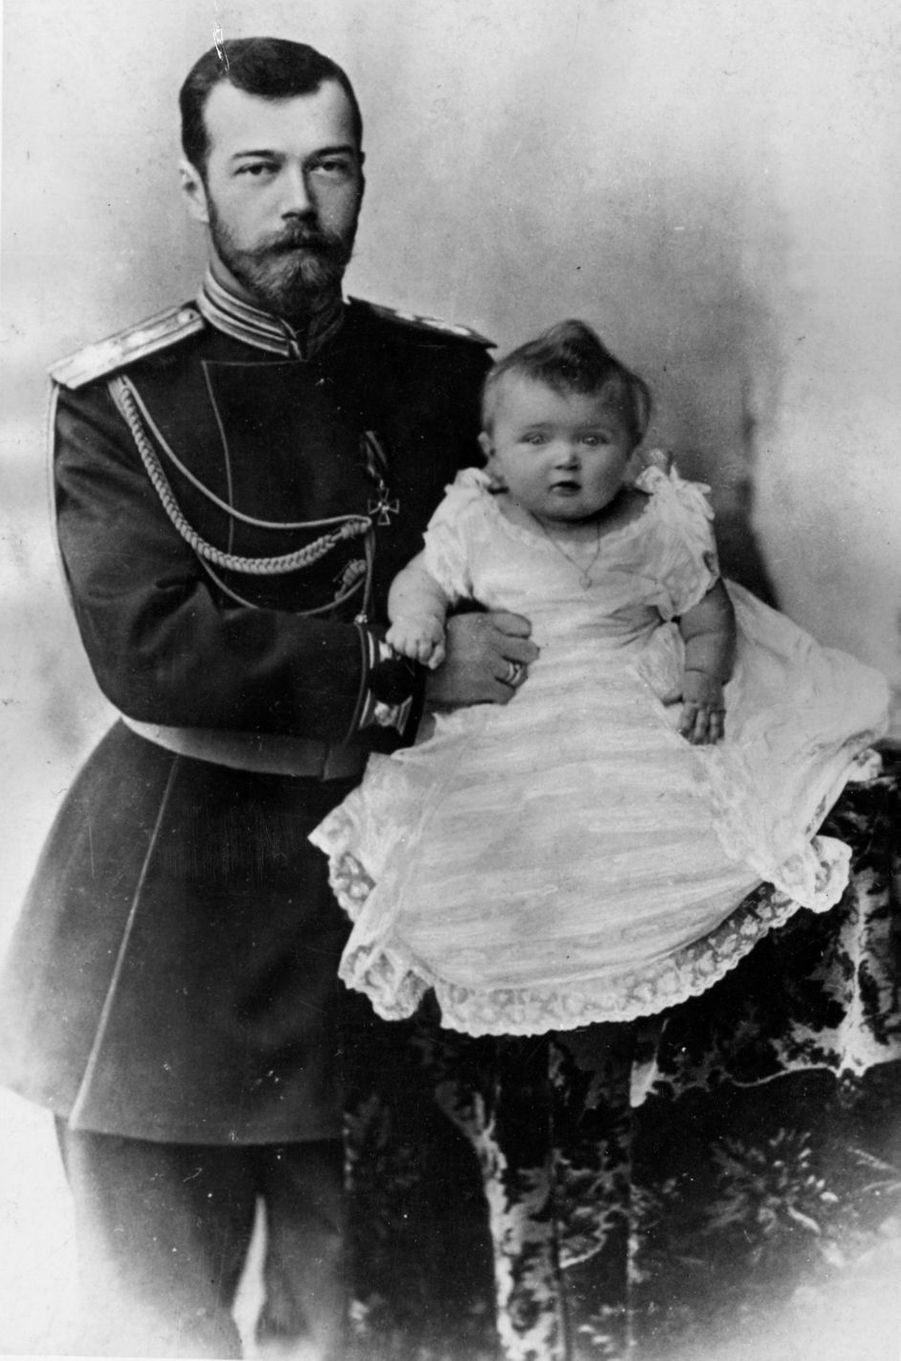 Le tsar de Russie Nicolas II avec la grande-duchesse Olga en 1895